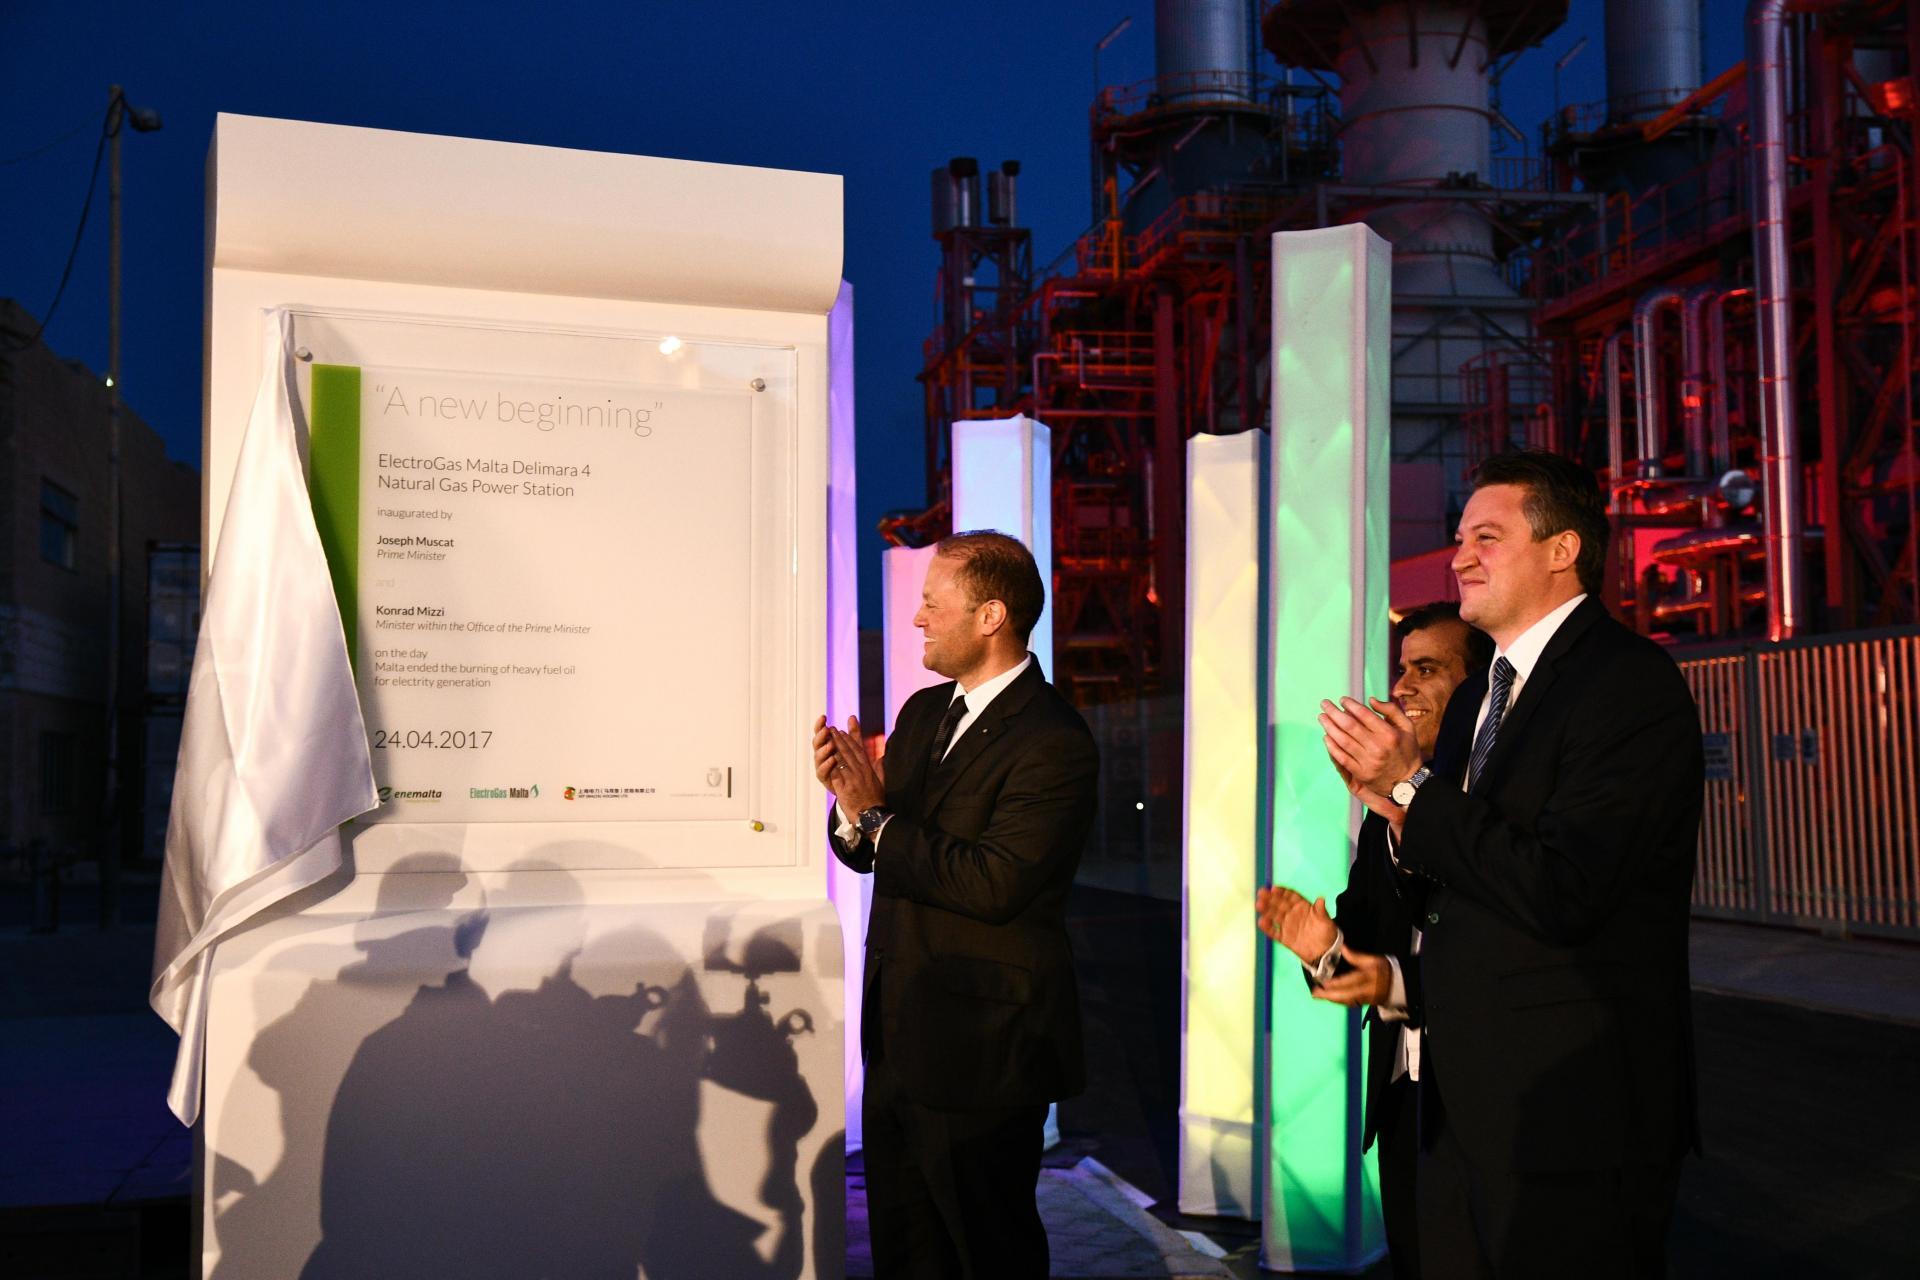 From left: Former prime minister Joseph Muscat, former Enemalta chairman Fredrick Azzopardi and former Energy Minister Konrad Mizzi inaugurate the Delimara power station. Photo: DOI/Jason Borg